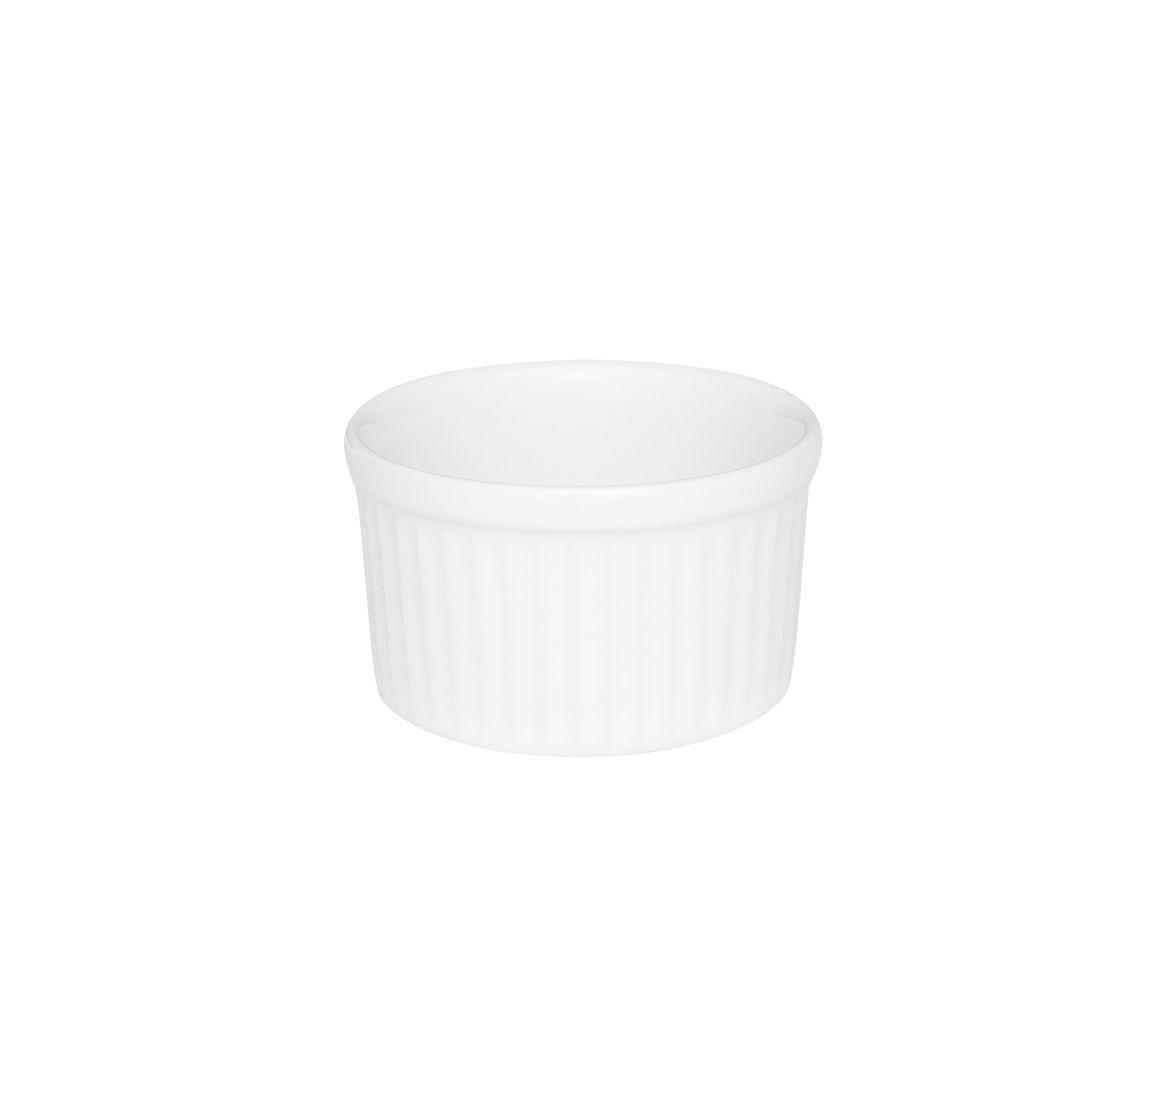 Tigela Ramequin 6X3Cm 50Ml - Branco - Oxford Cookware